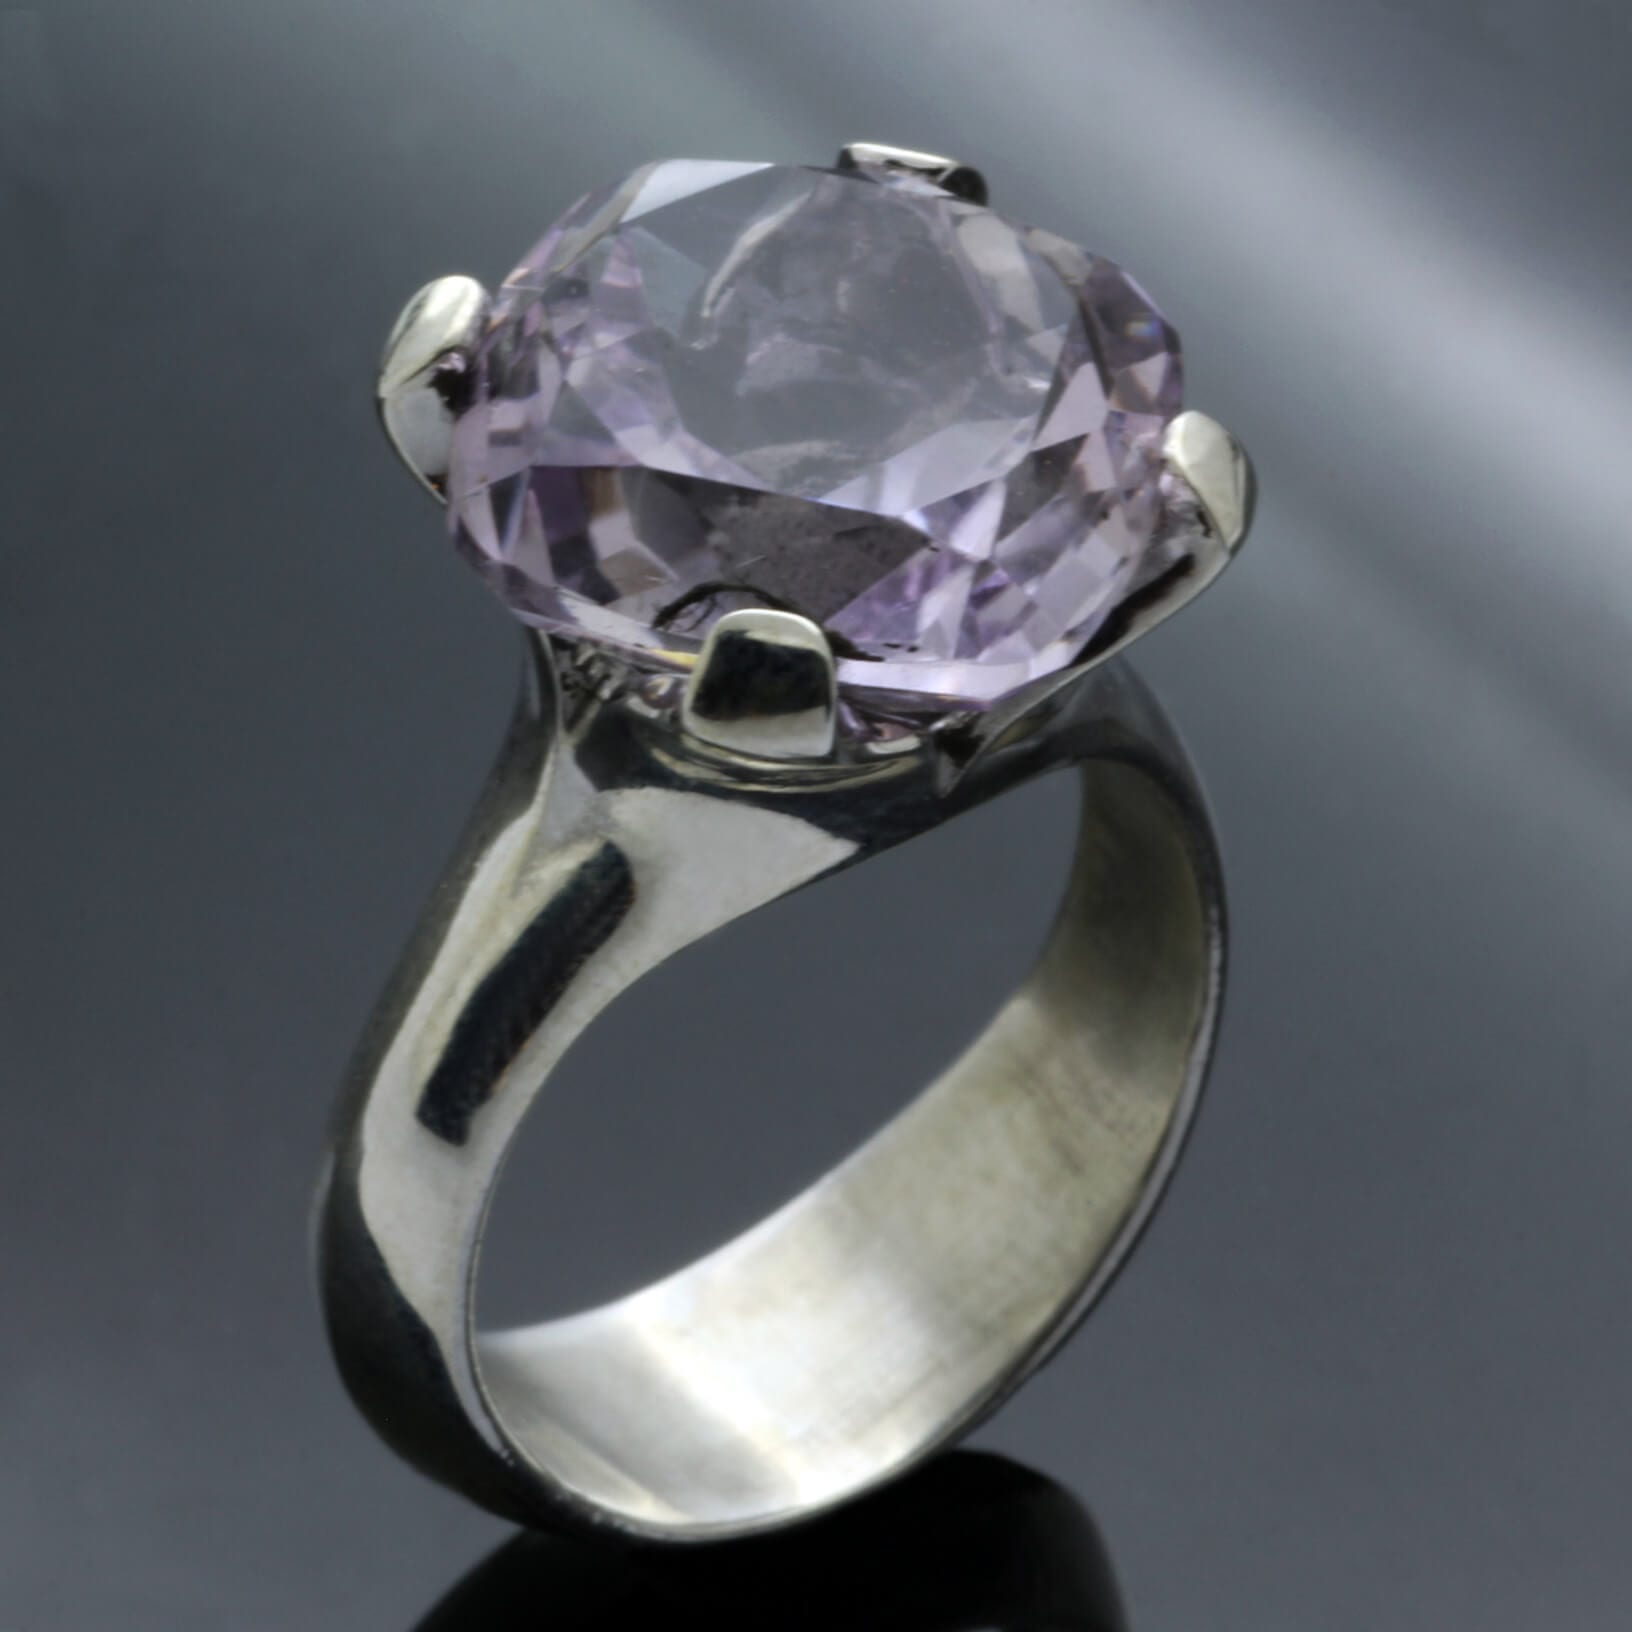 Lilac Amethyst gemstone Sterling Silver handmade statement ring